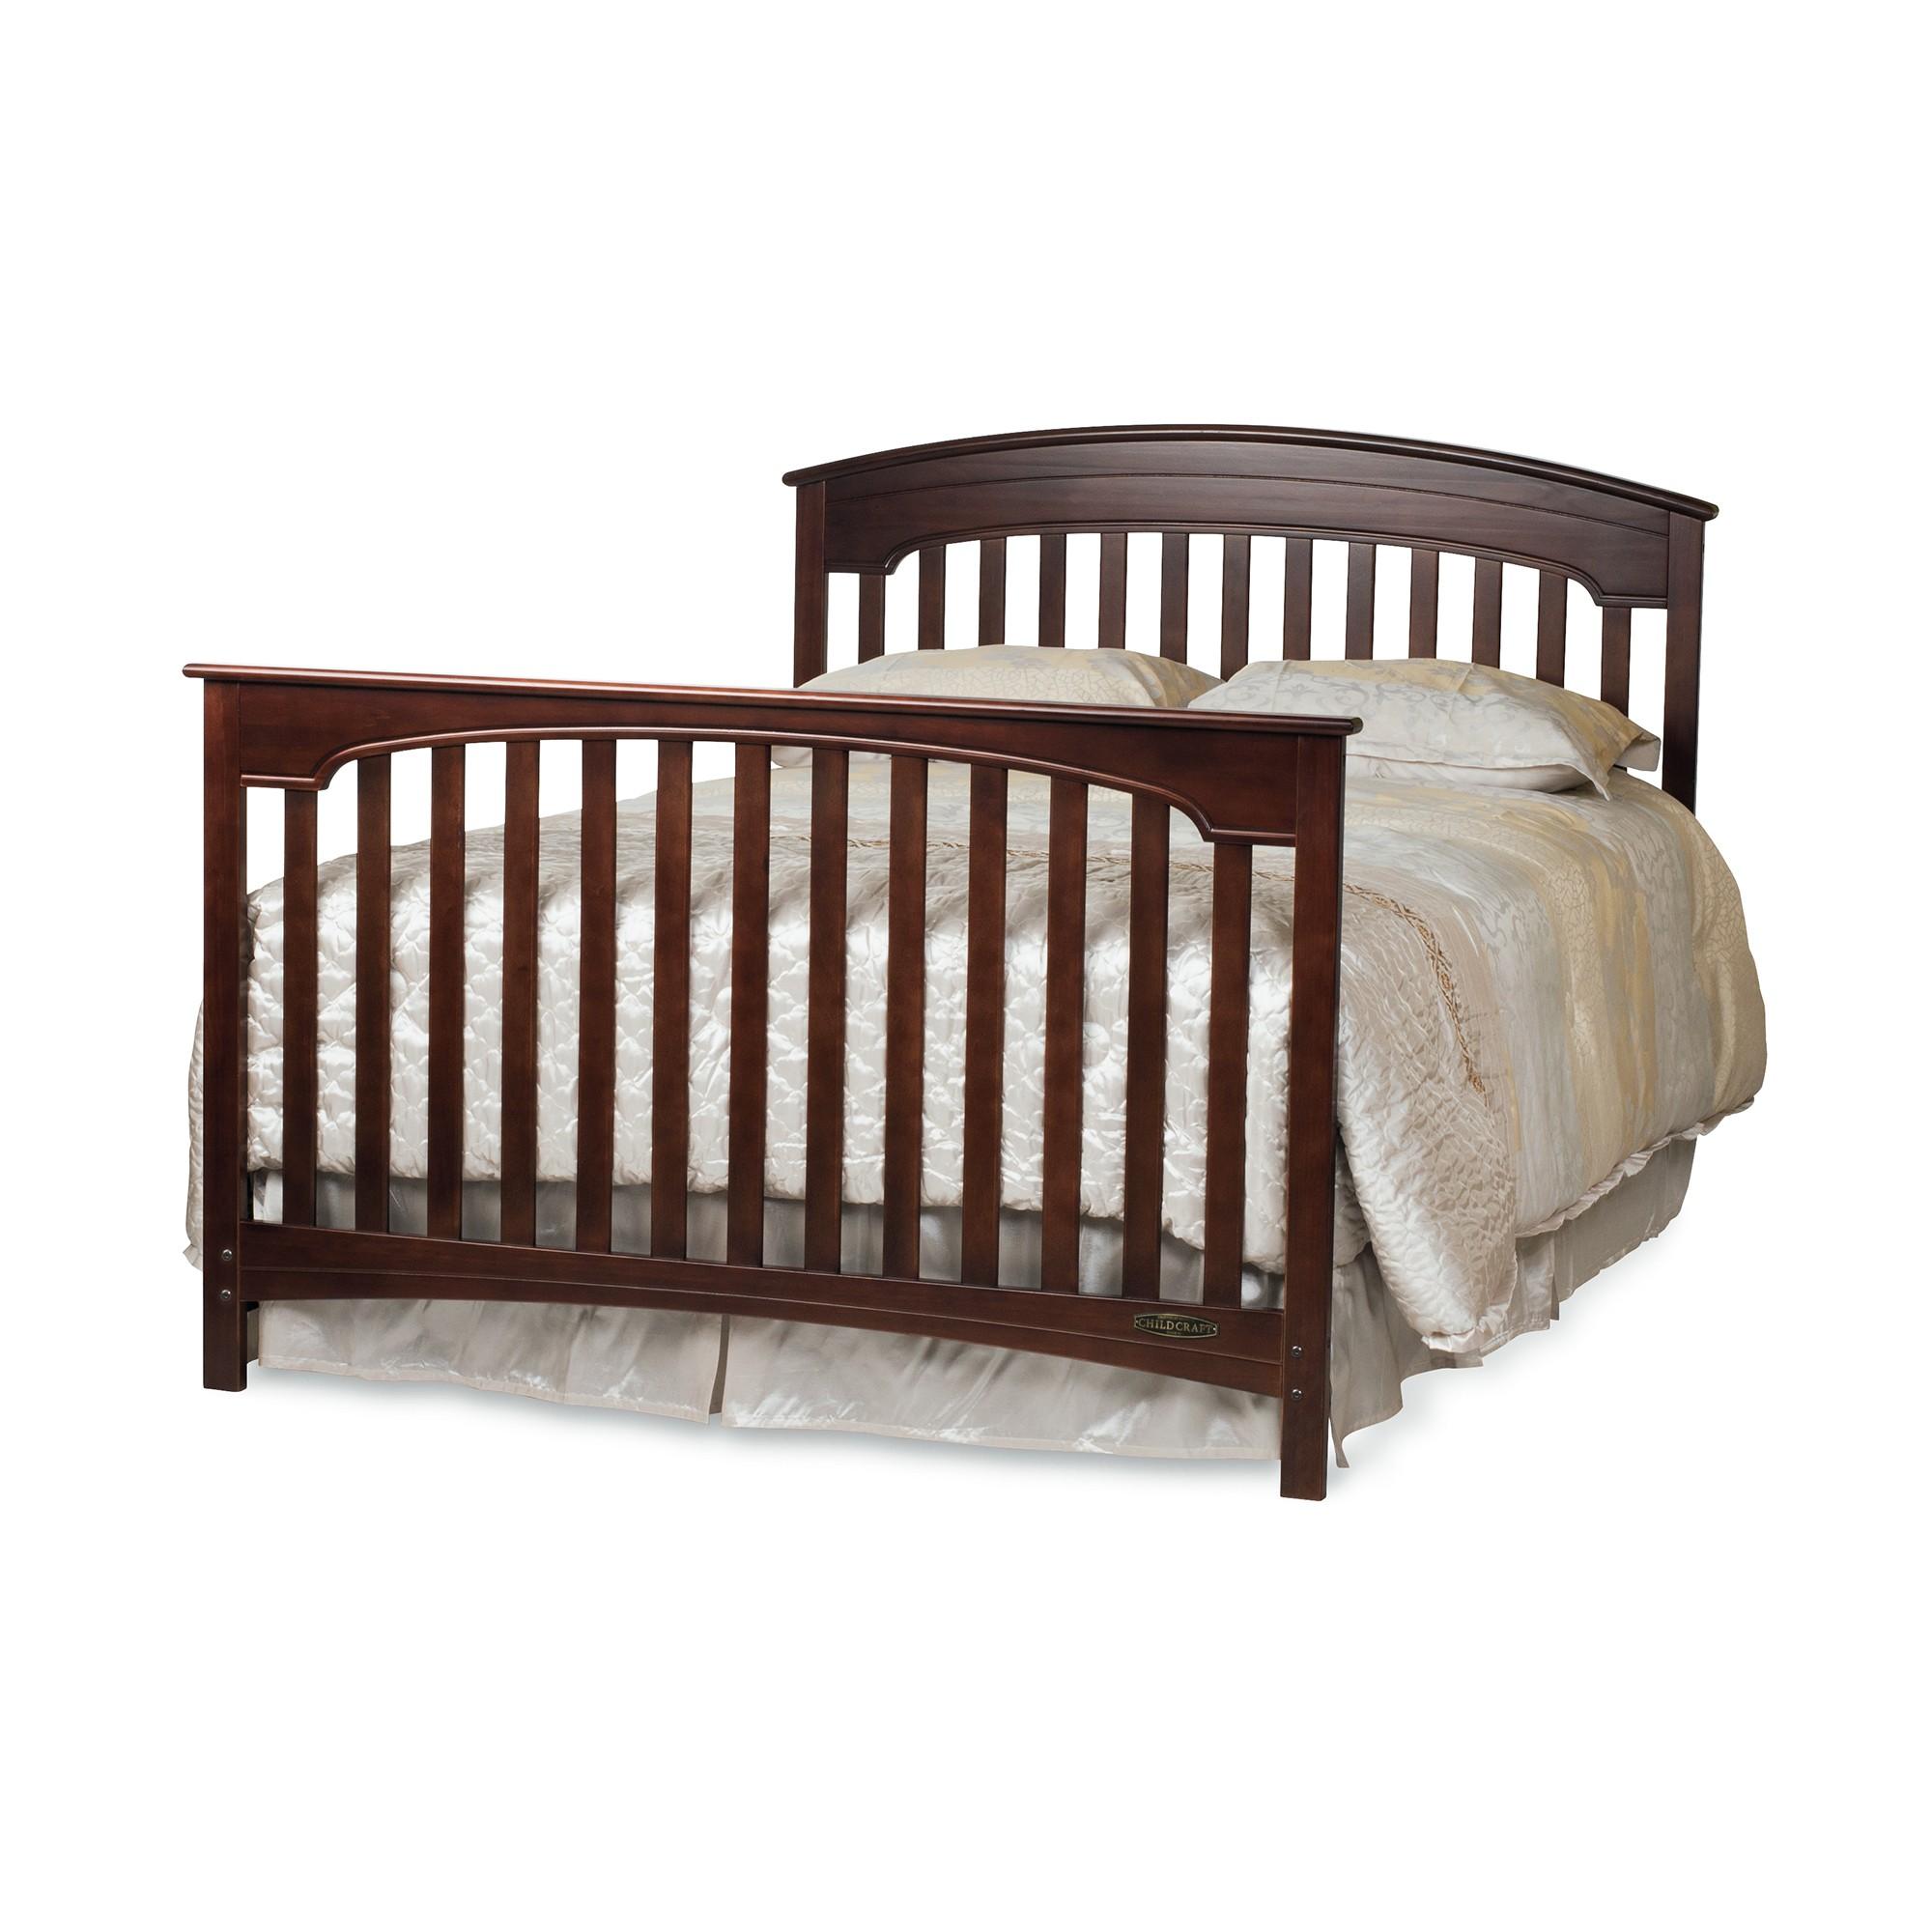 Buy Buy Baby Convertible Crib Baby Appleseed 174 Davenport 4 In 1 Convertible Crib In Moon